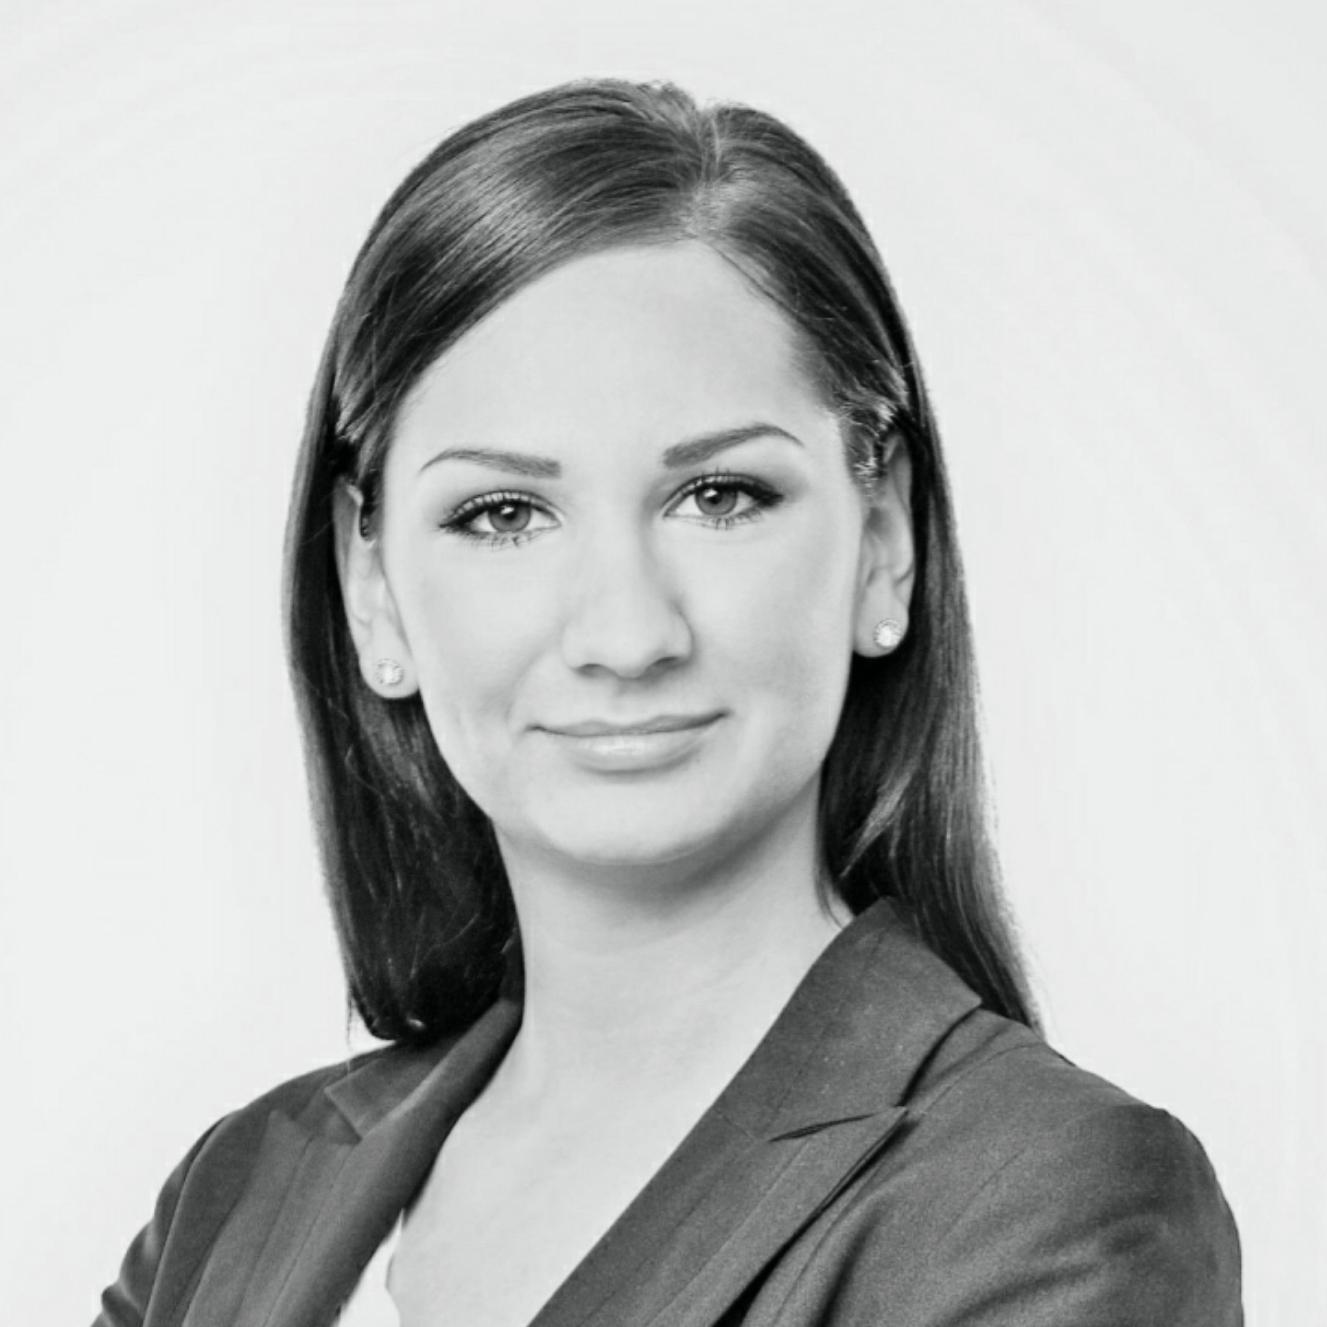 Cindy Glod